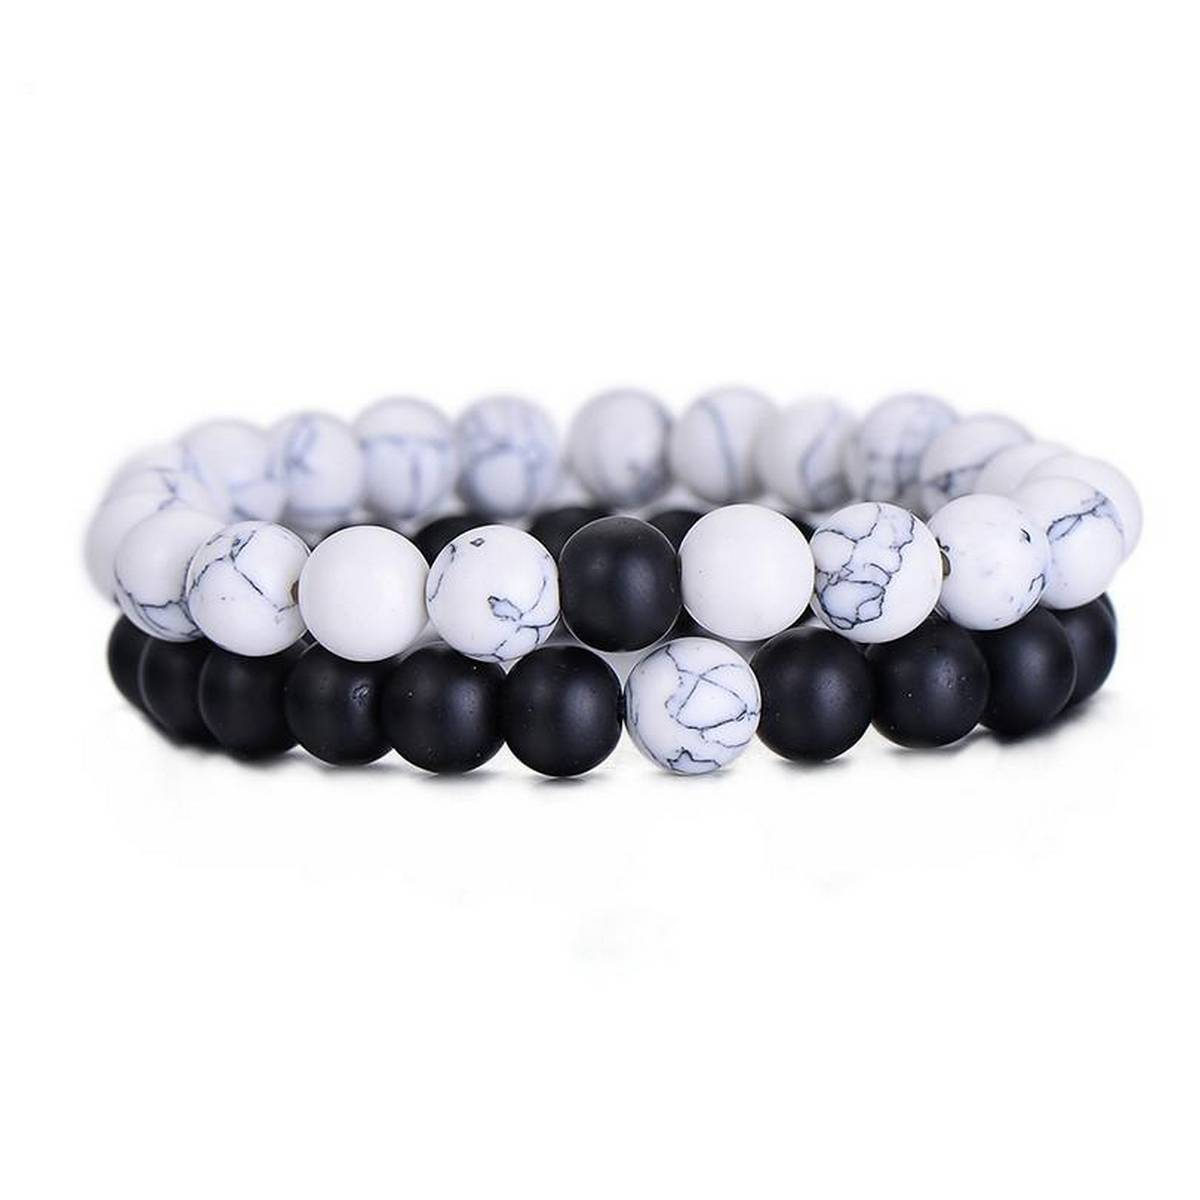 Couples Distance Bracelet Classic Natural Stone White and Black Yin Yang Beaded Bracelets for Men Women Best Friend Hot